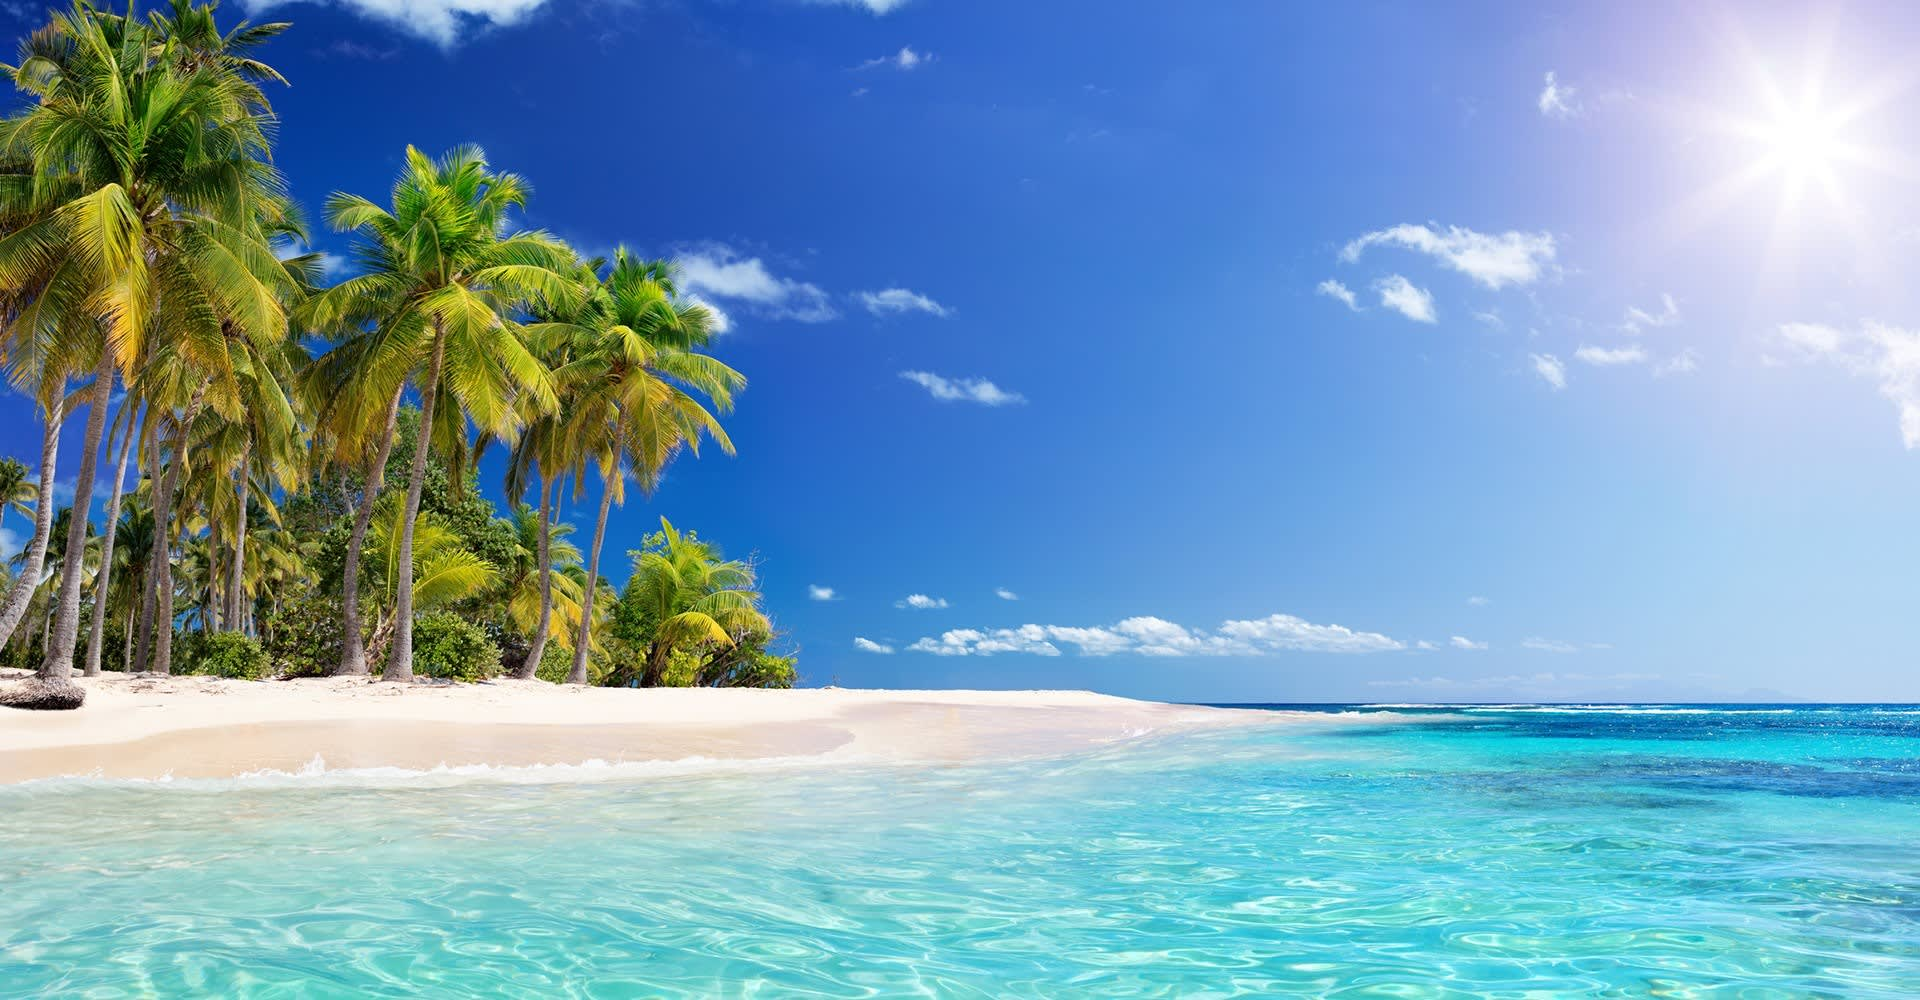 Playa del Carmen Hotel Bachelor Package